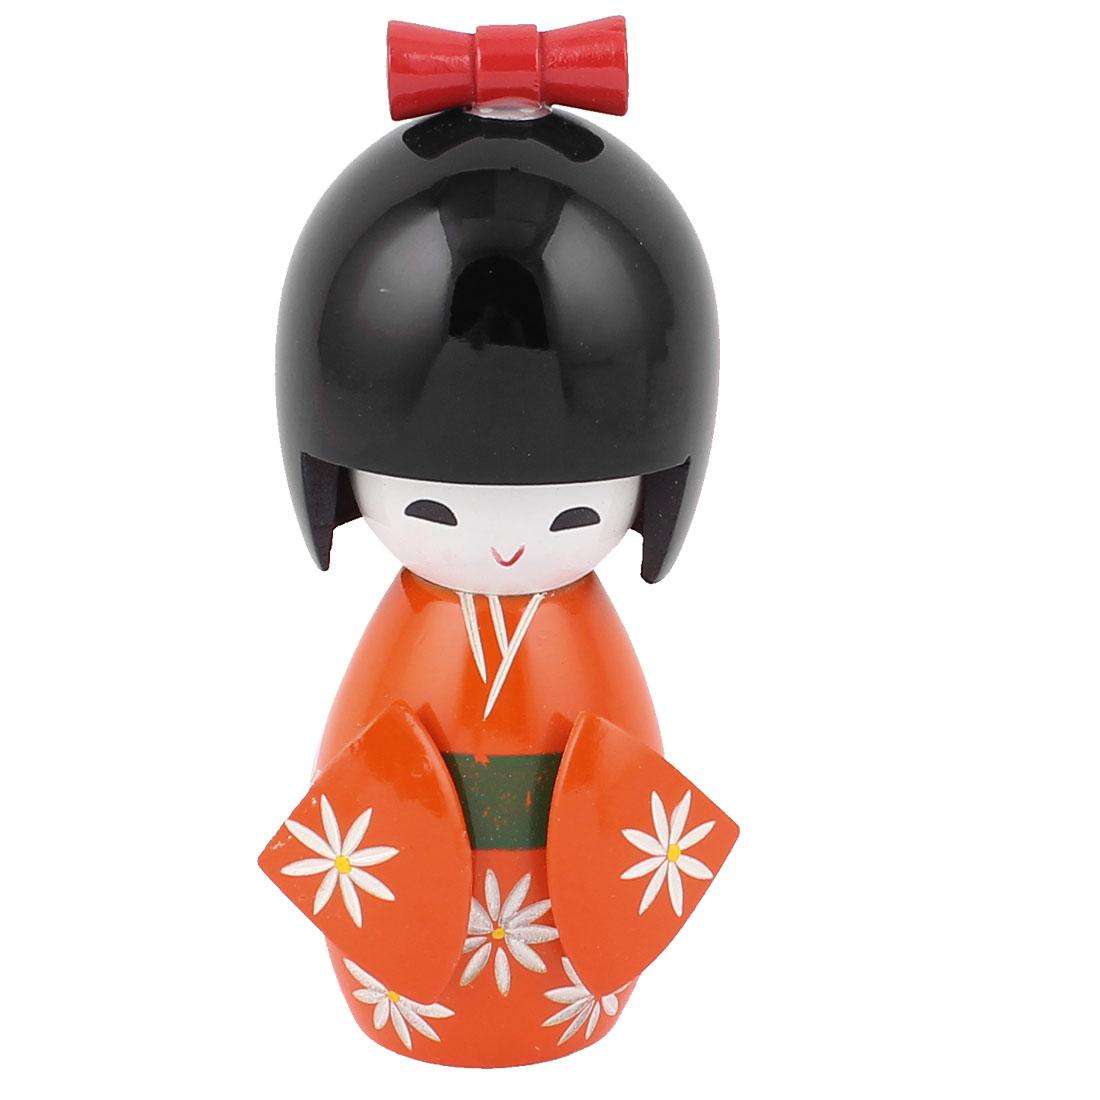 Wooden Traditional Japanese Kimono Kokeshi Doll Desk Decoration Orange